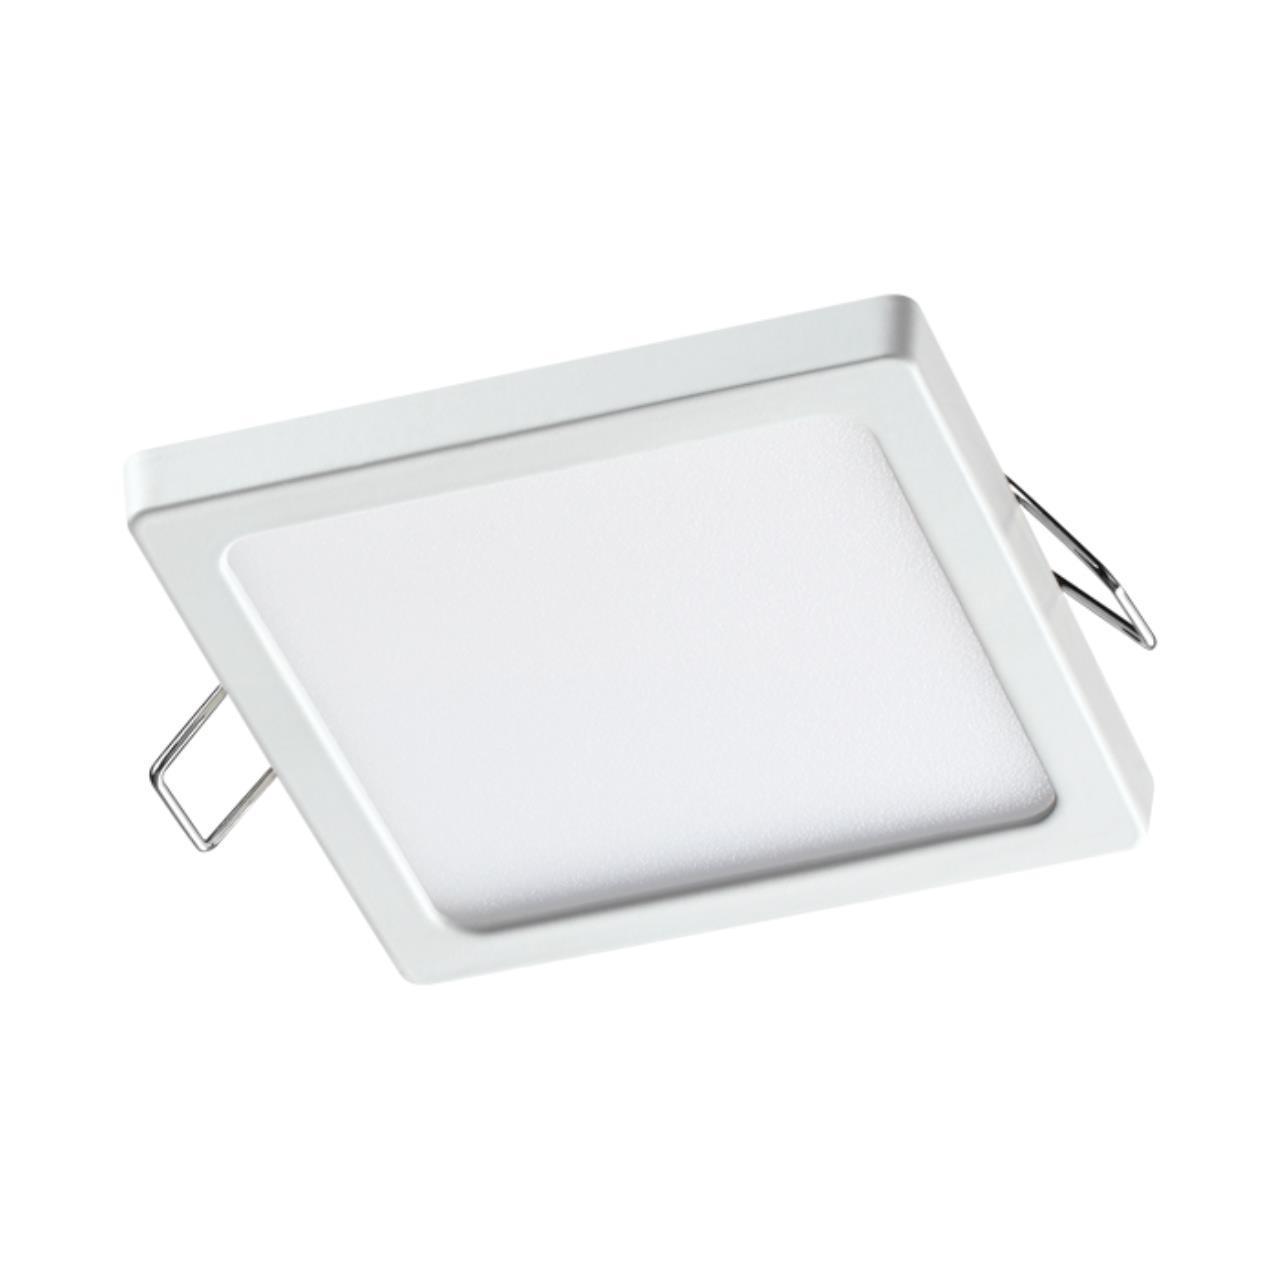 358271 SPOT NT19 000 белый Встраиваемый светильник IP20 LED 4000K 8W 85-265V STEA